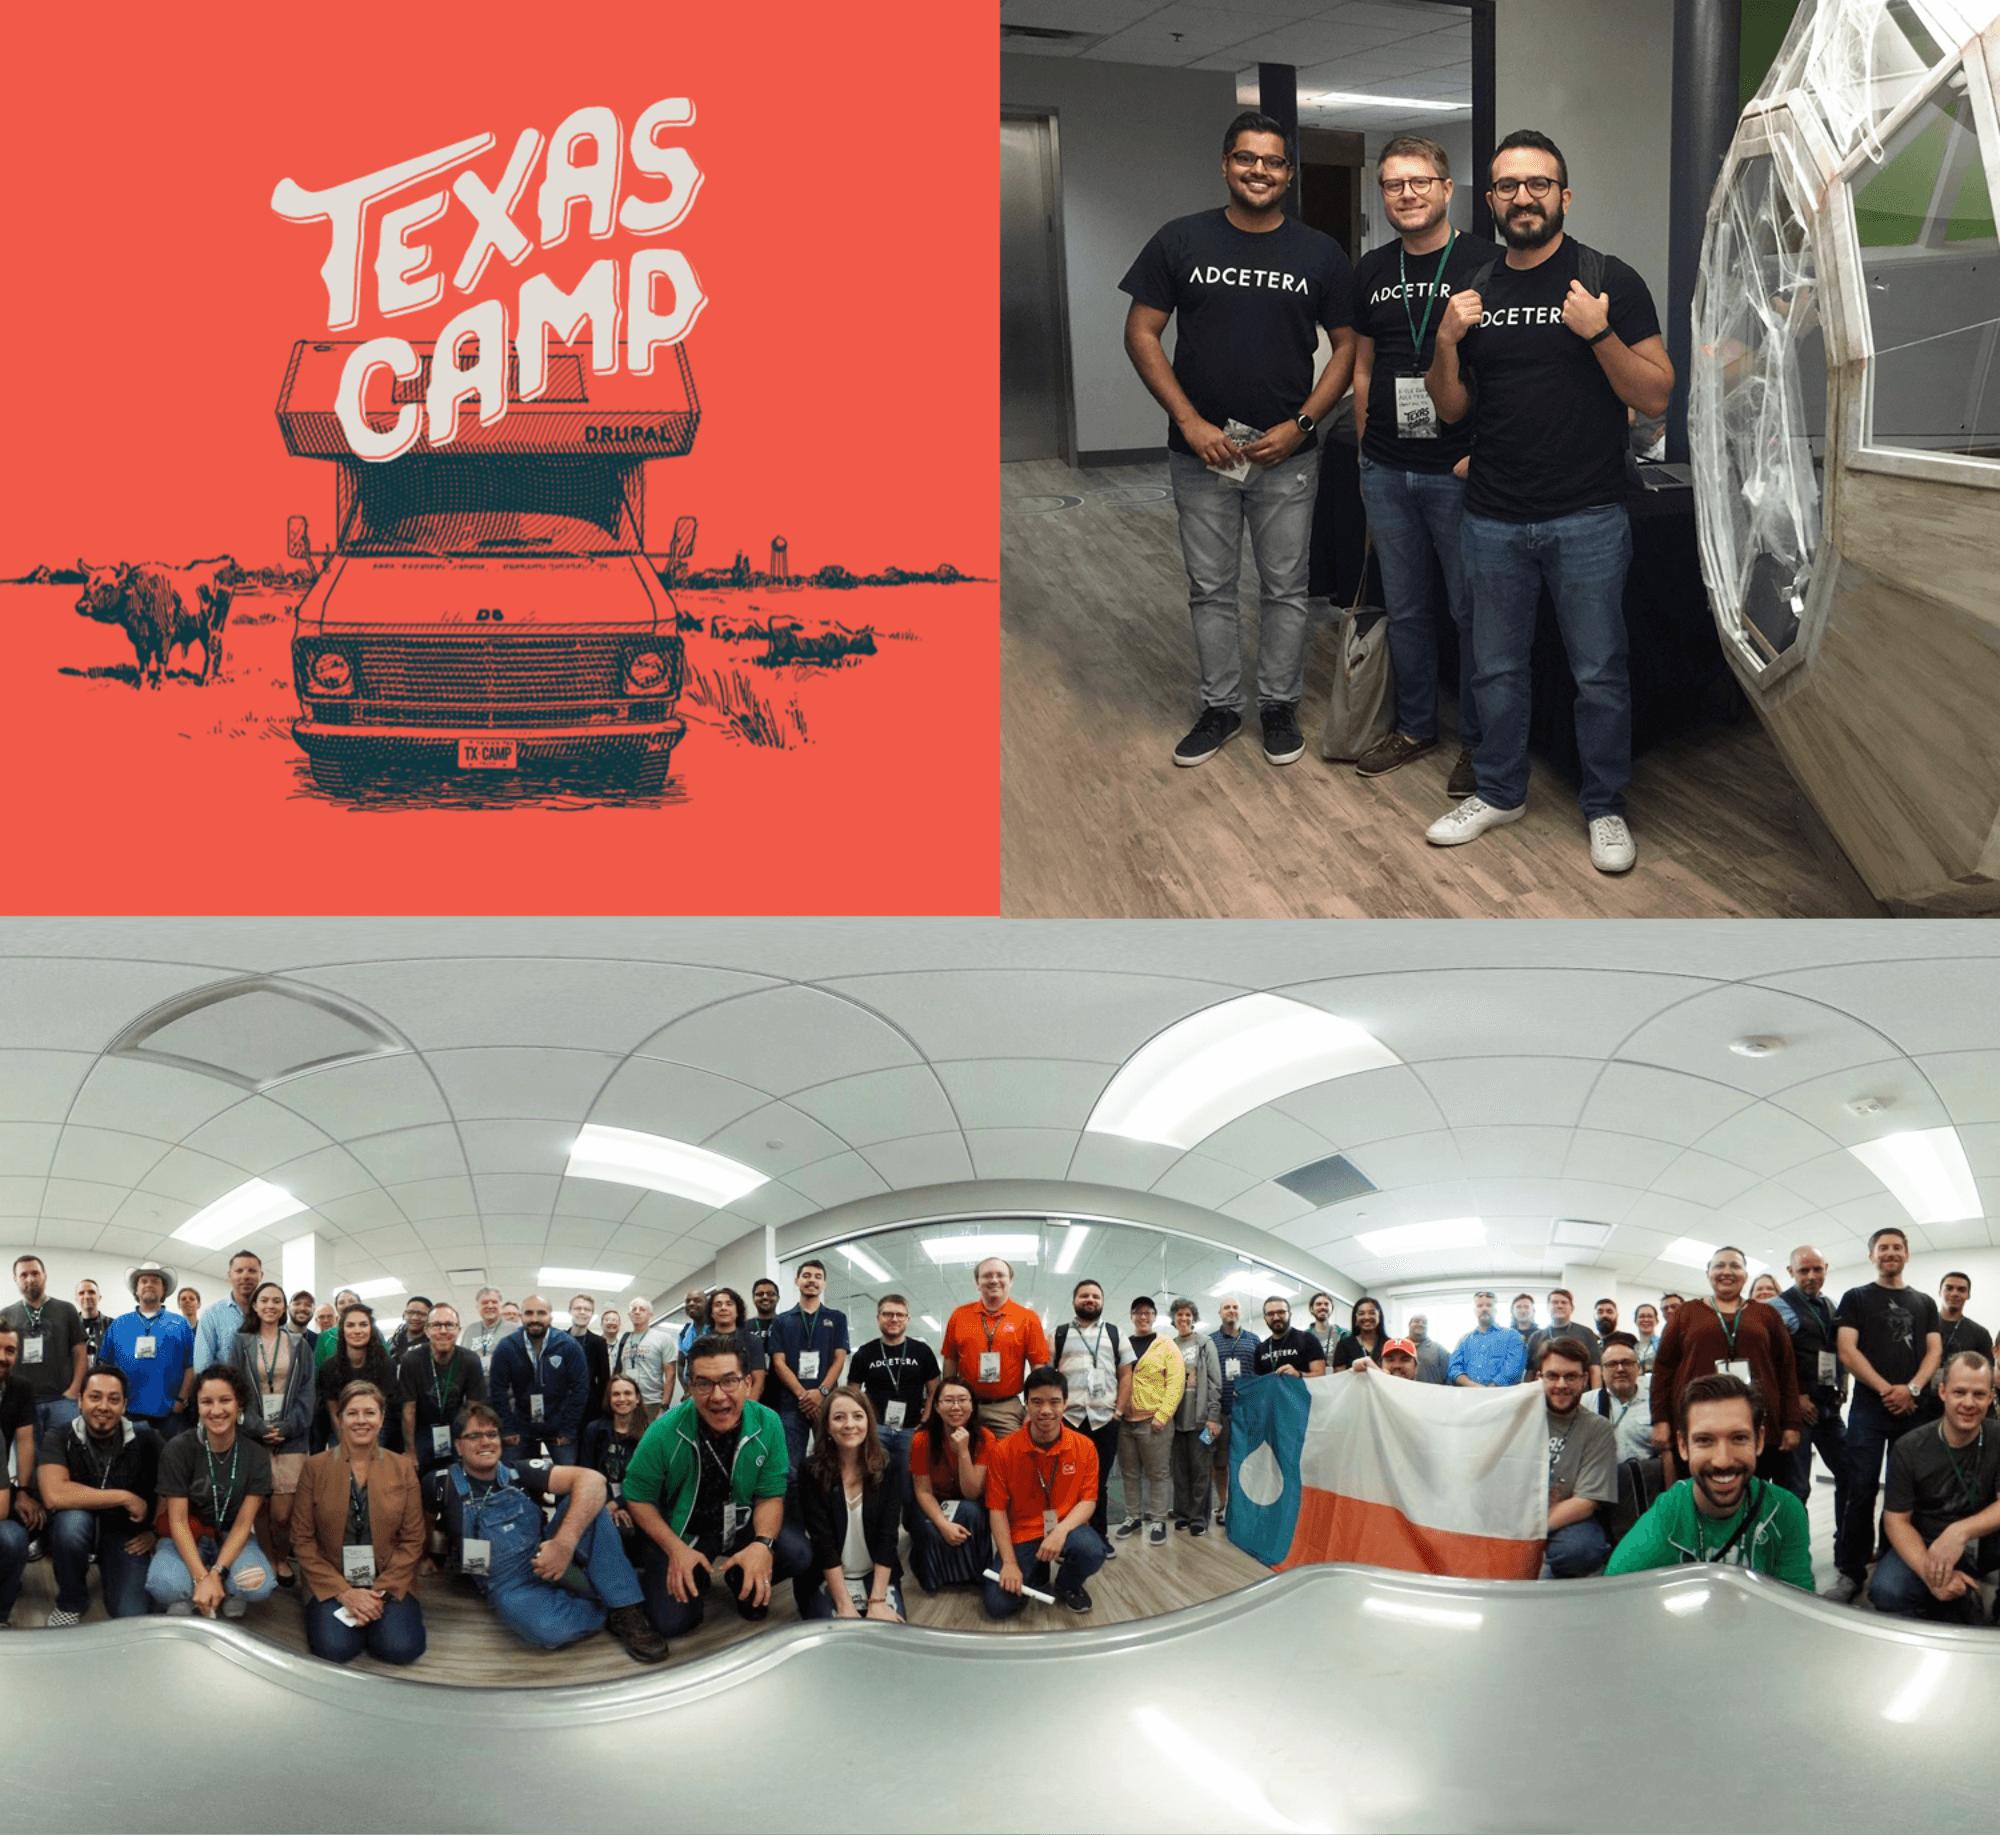 Texas Drupal Camp 2019